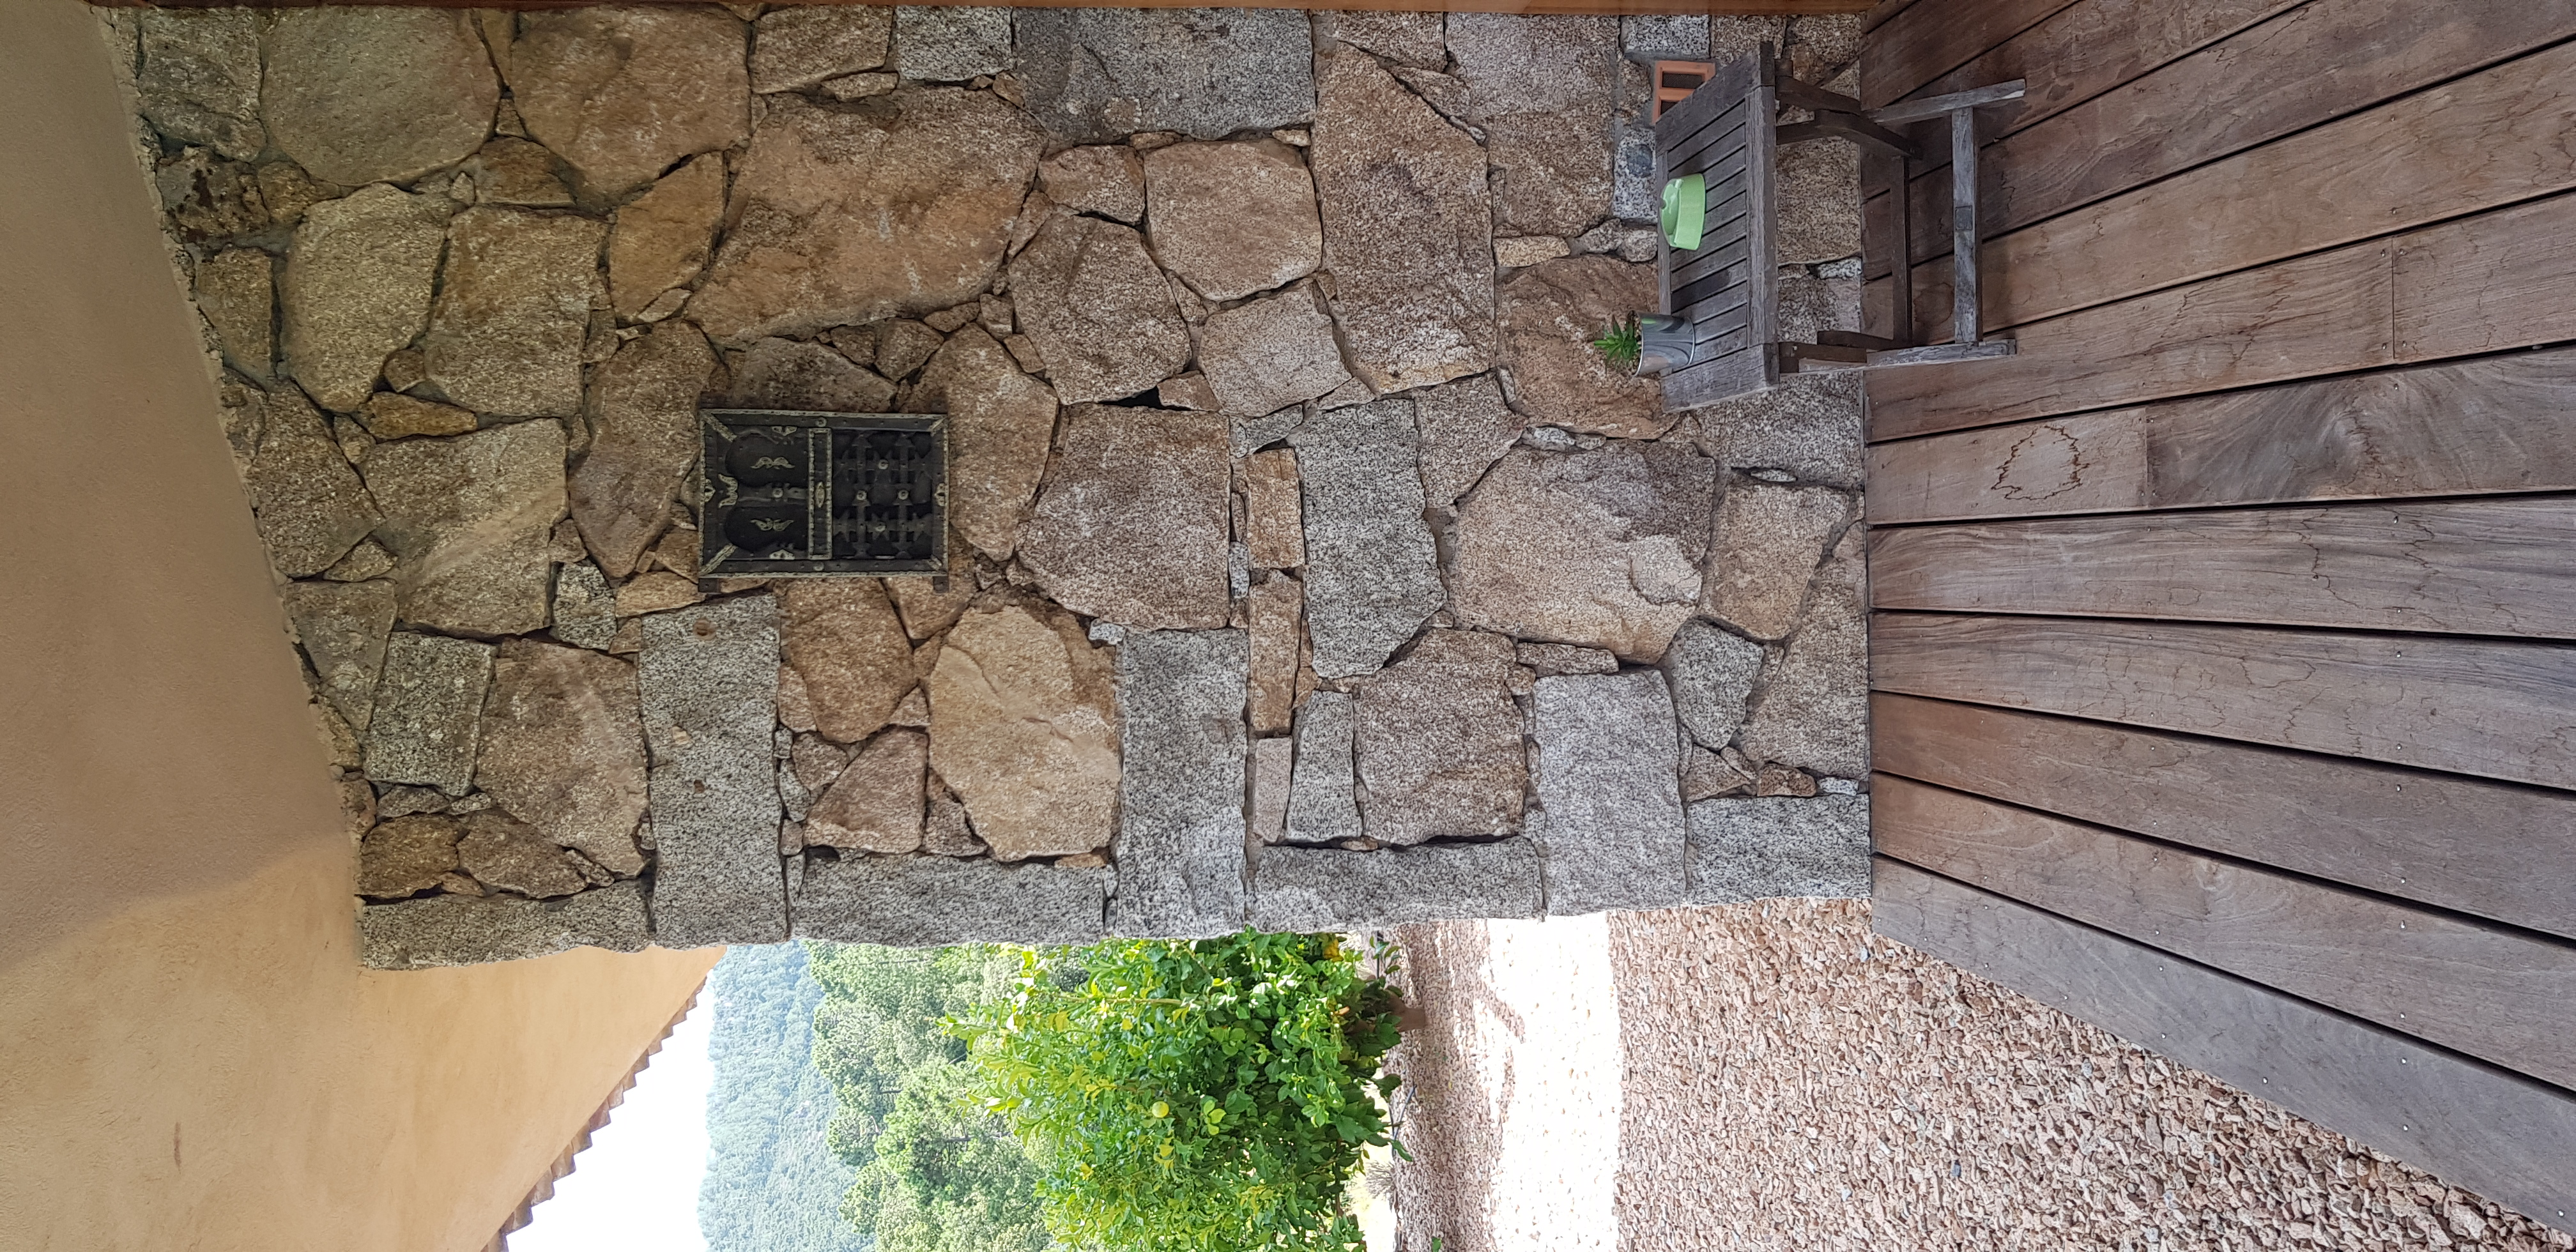 charmantes Süd Korsika, Ferienhaus mieten mit Pool